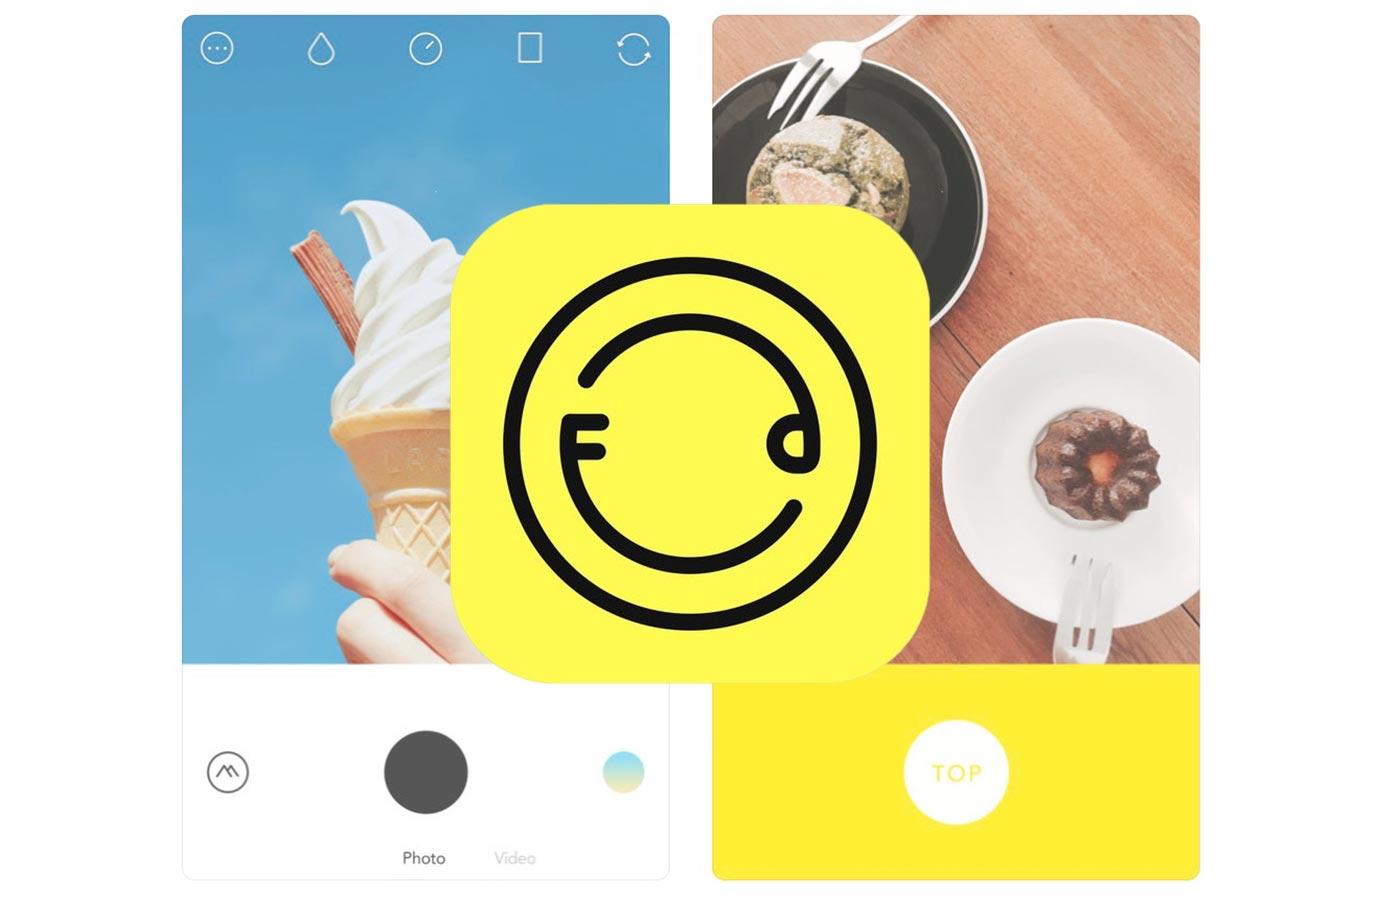 iOS向けカメラアプリ「Foodie」がアップデートで「iPhone X」に対応